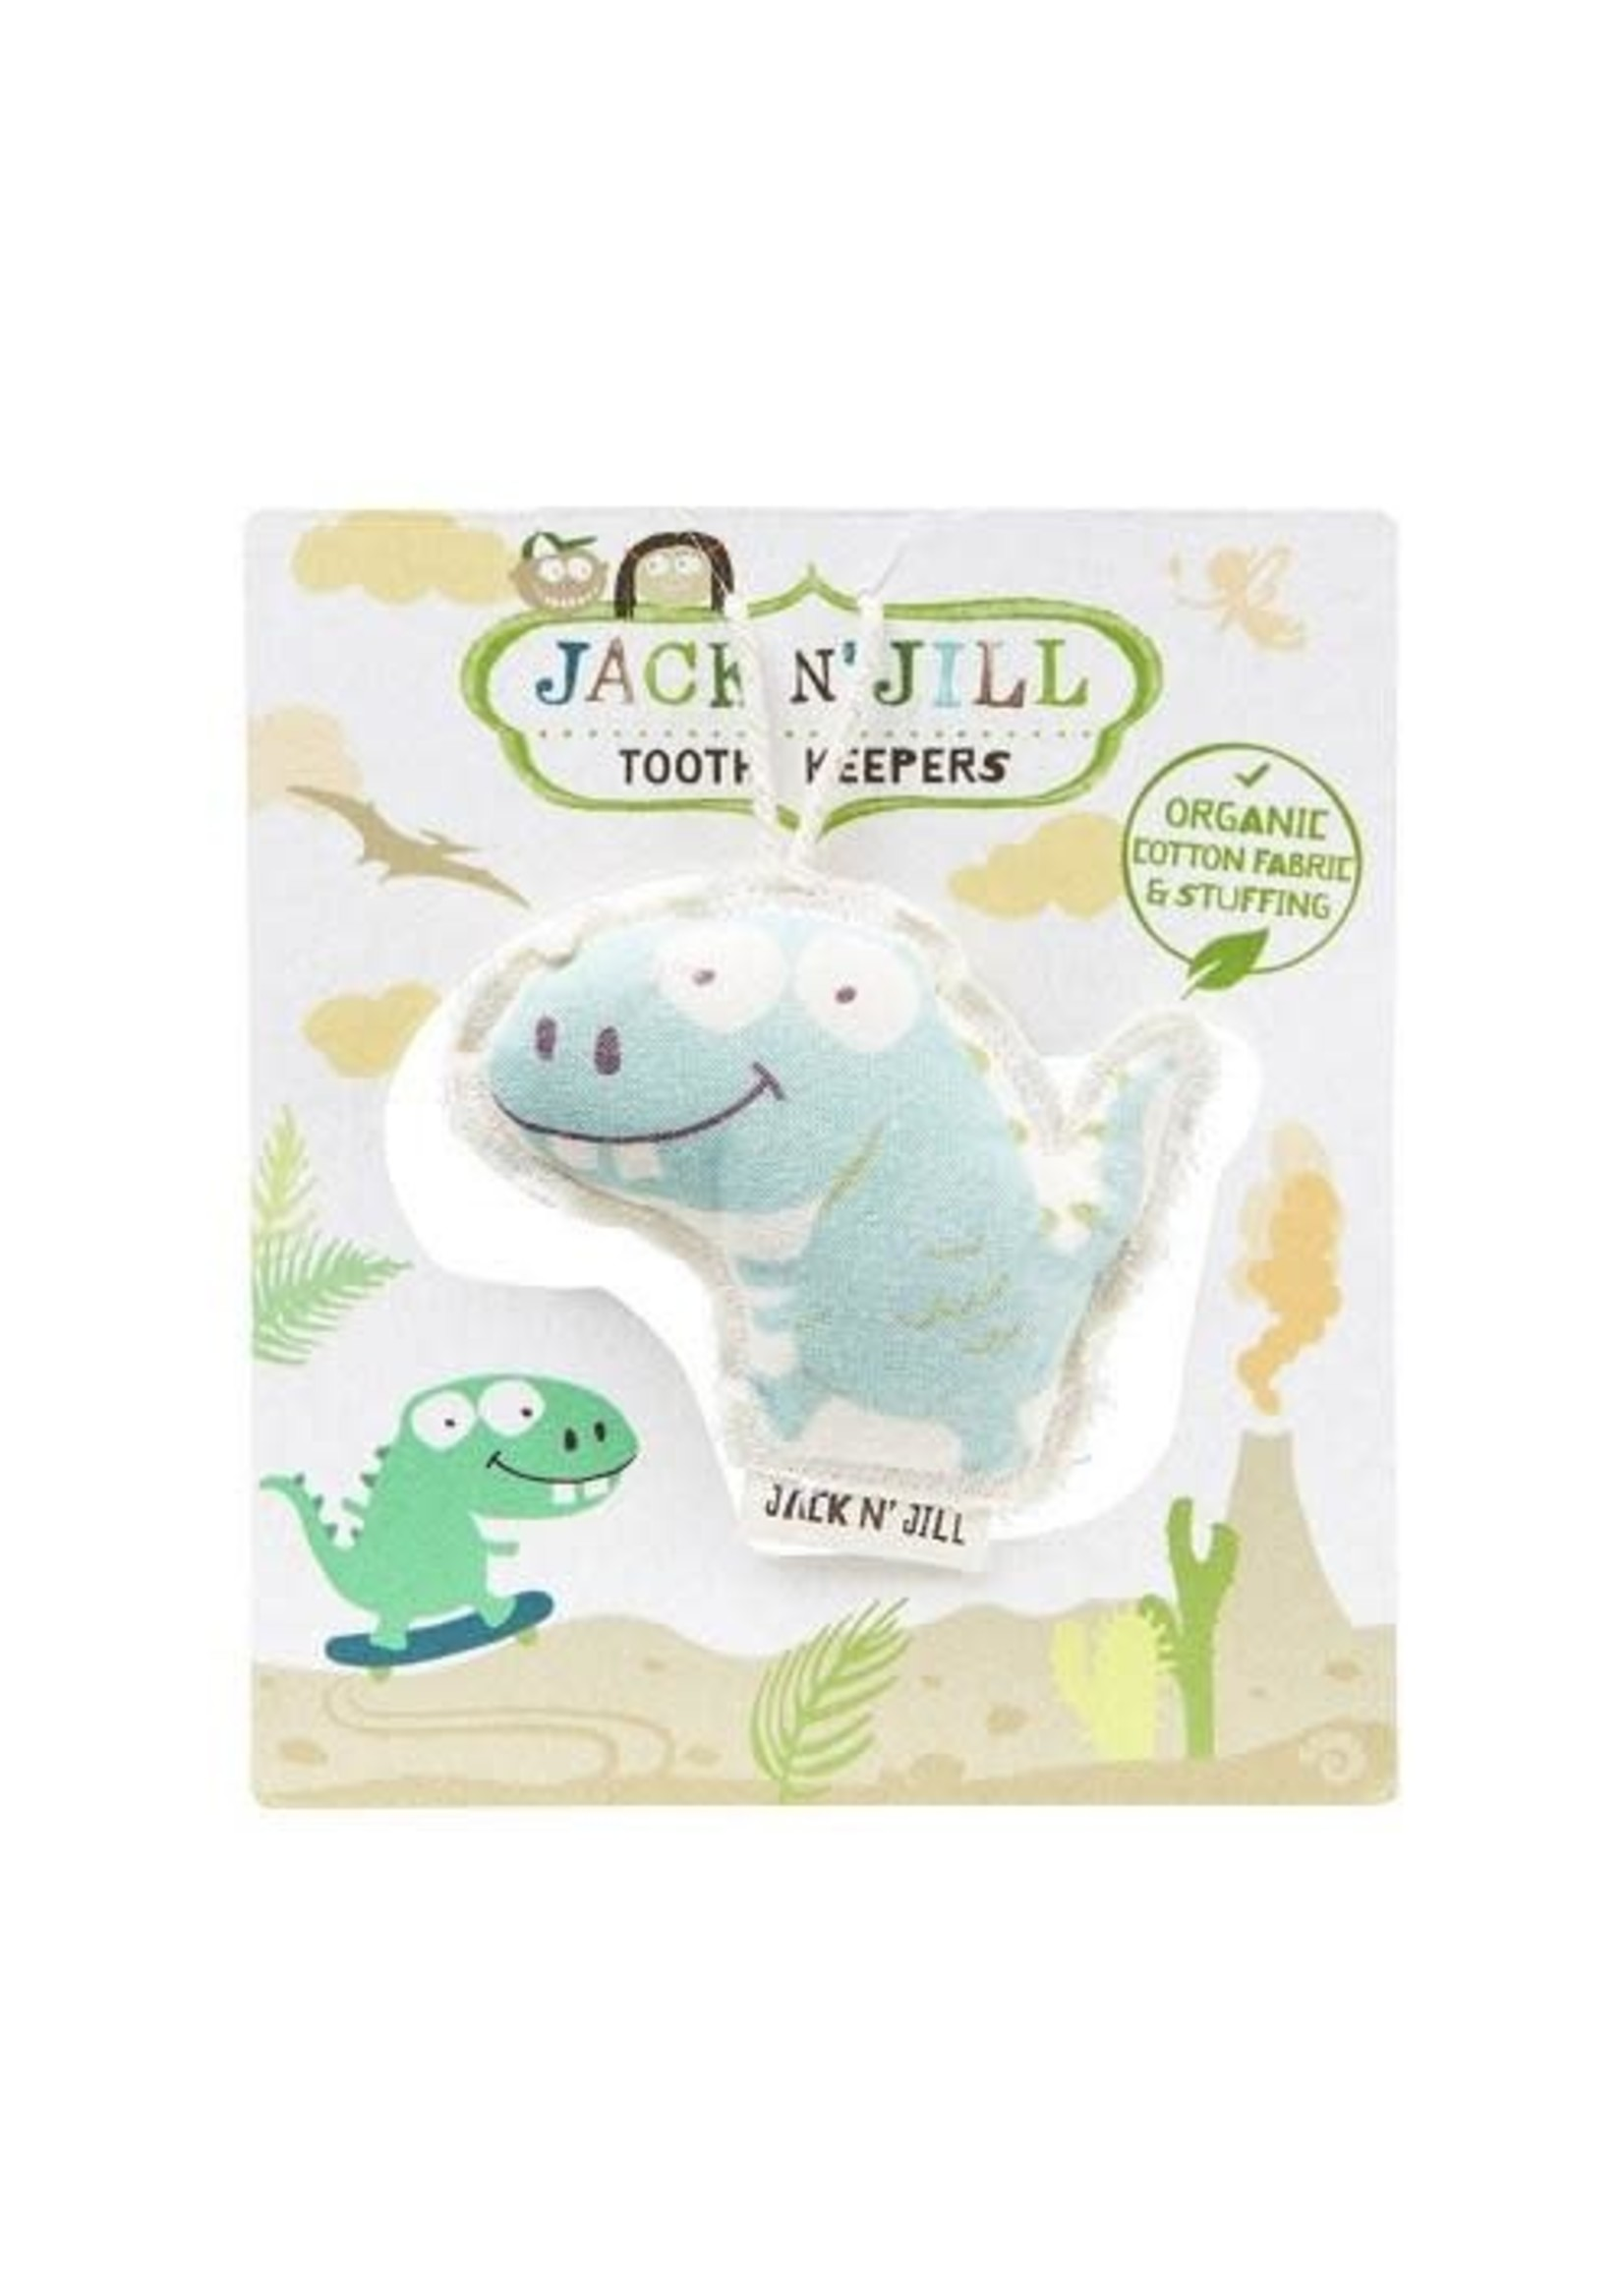 Jack N Jill Jack n Jill tooth keeper